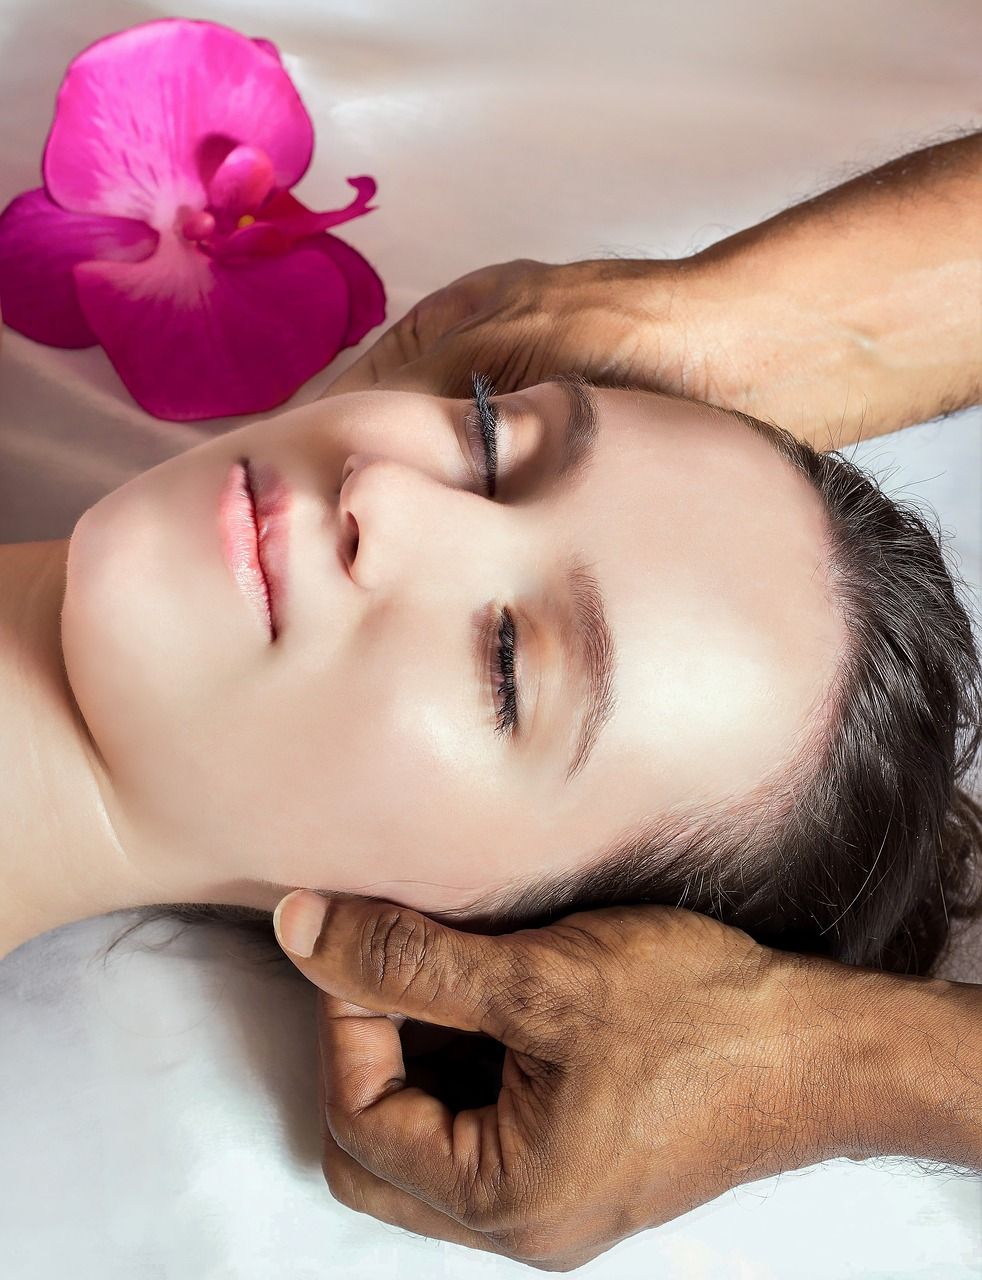 woman, young, massage